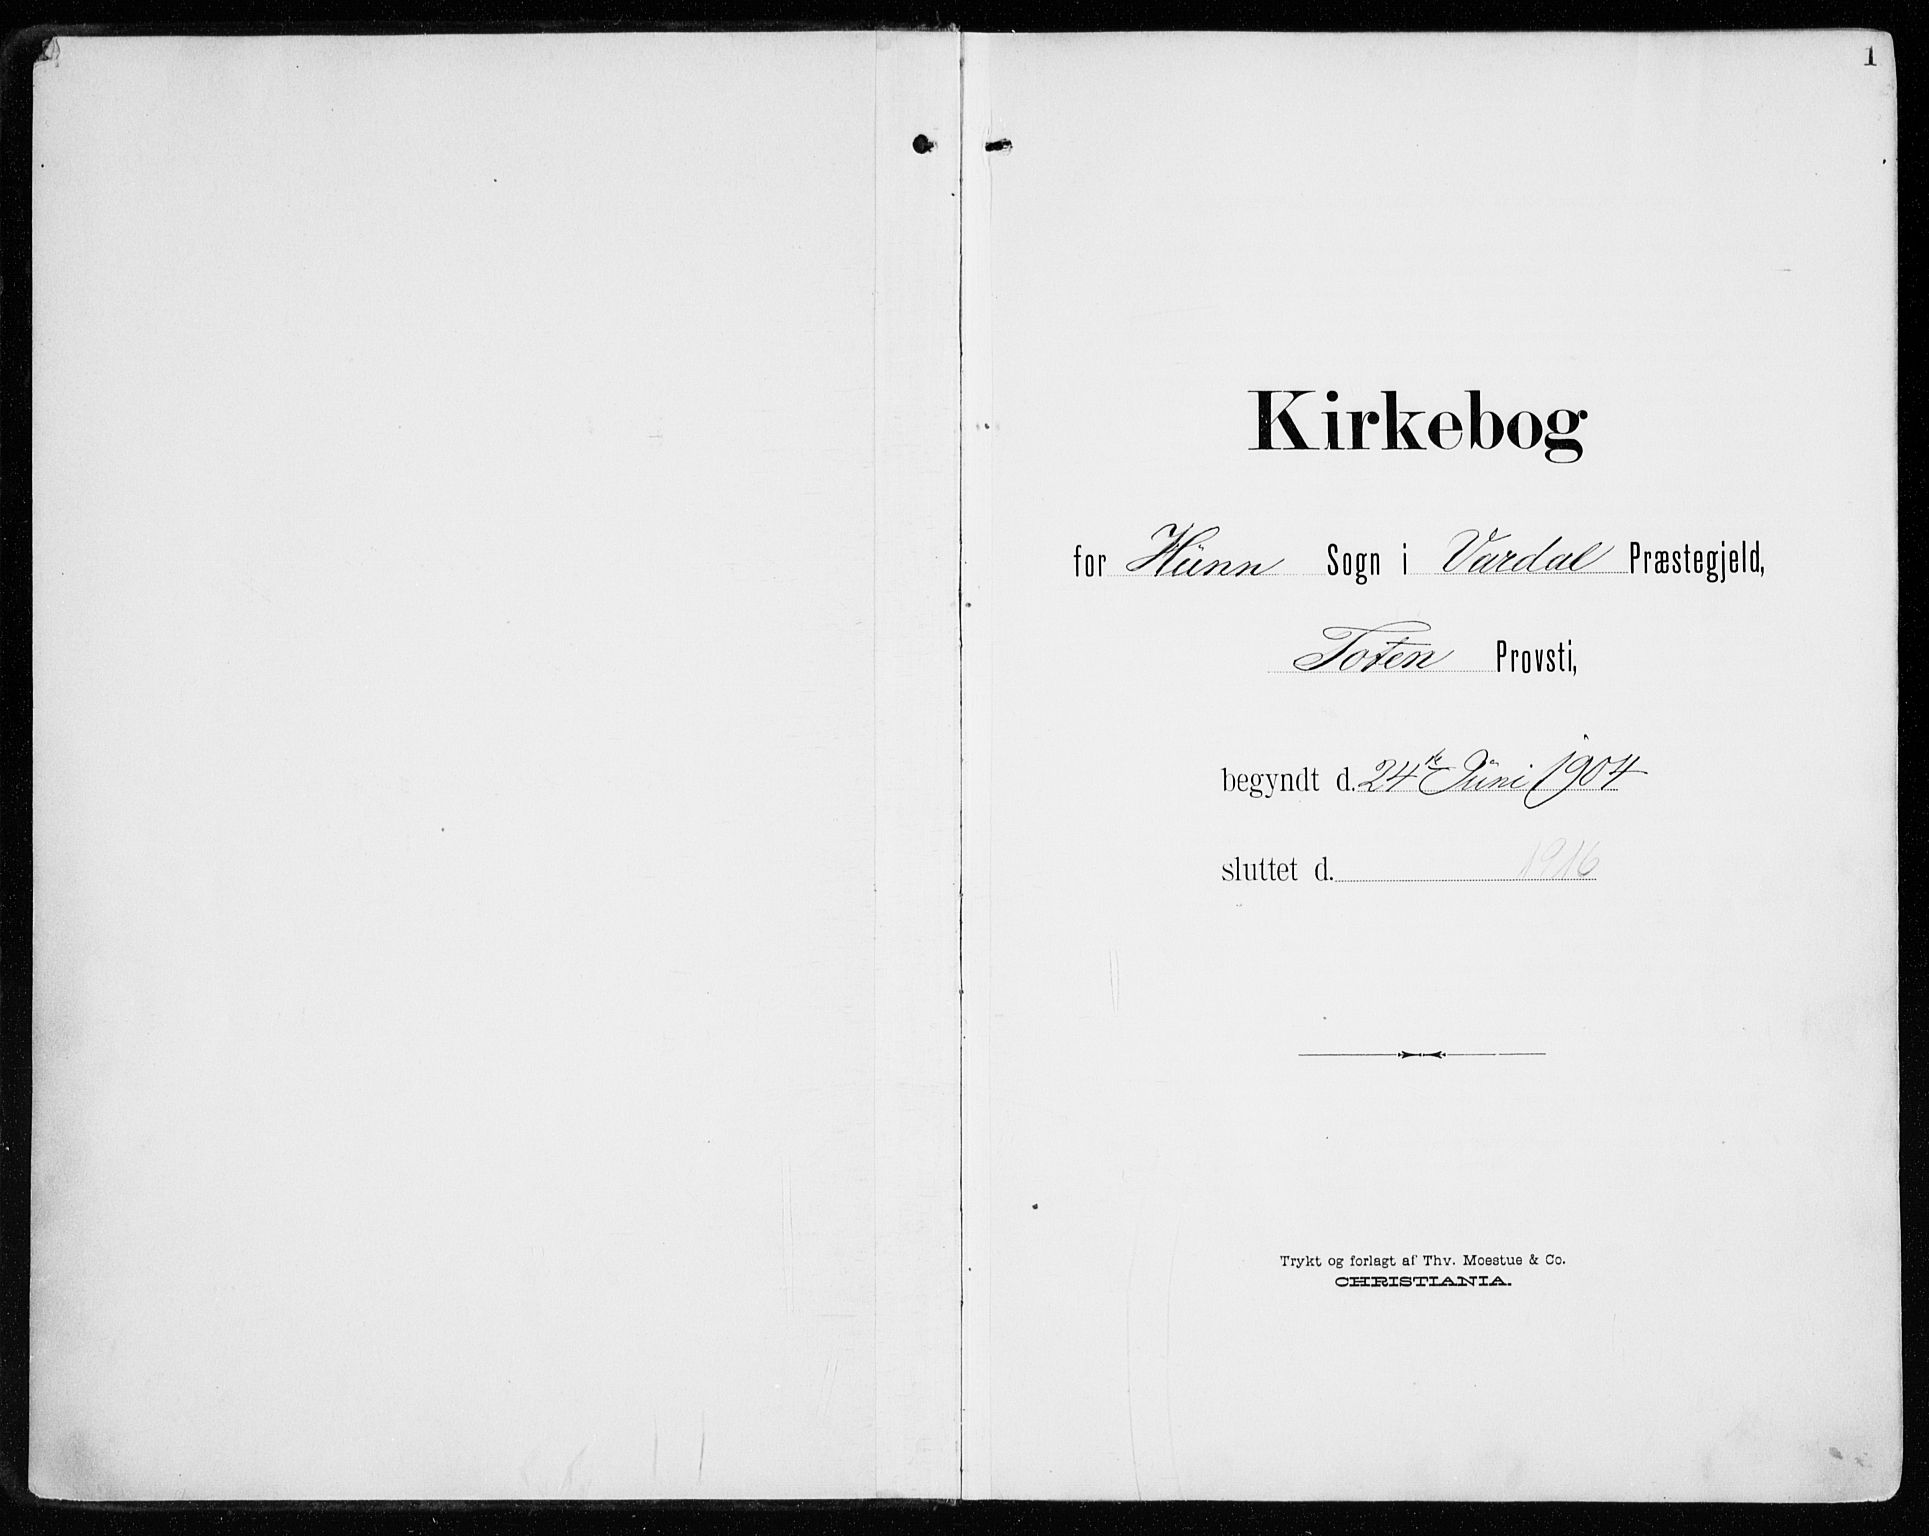 SAH, Vardal prestekontor, H/Ha/Haa/L0016: Ministerialbok nr. 16, 1904-1916, s. 1